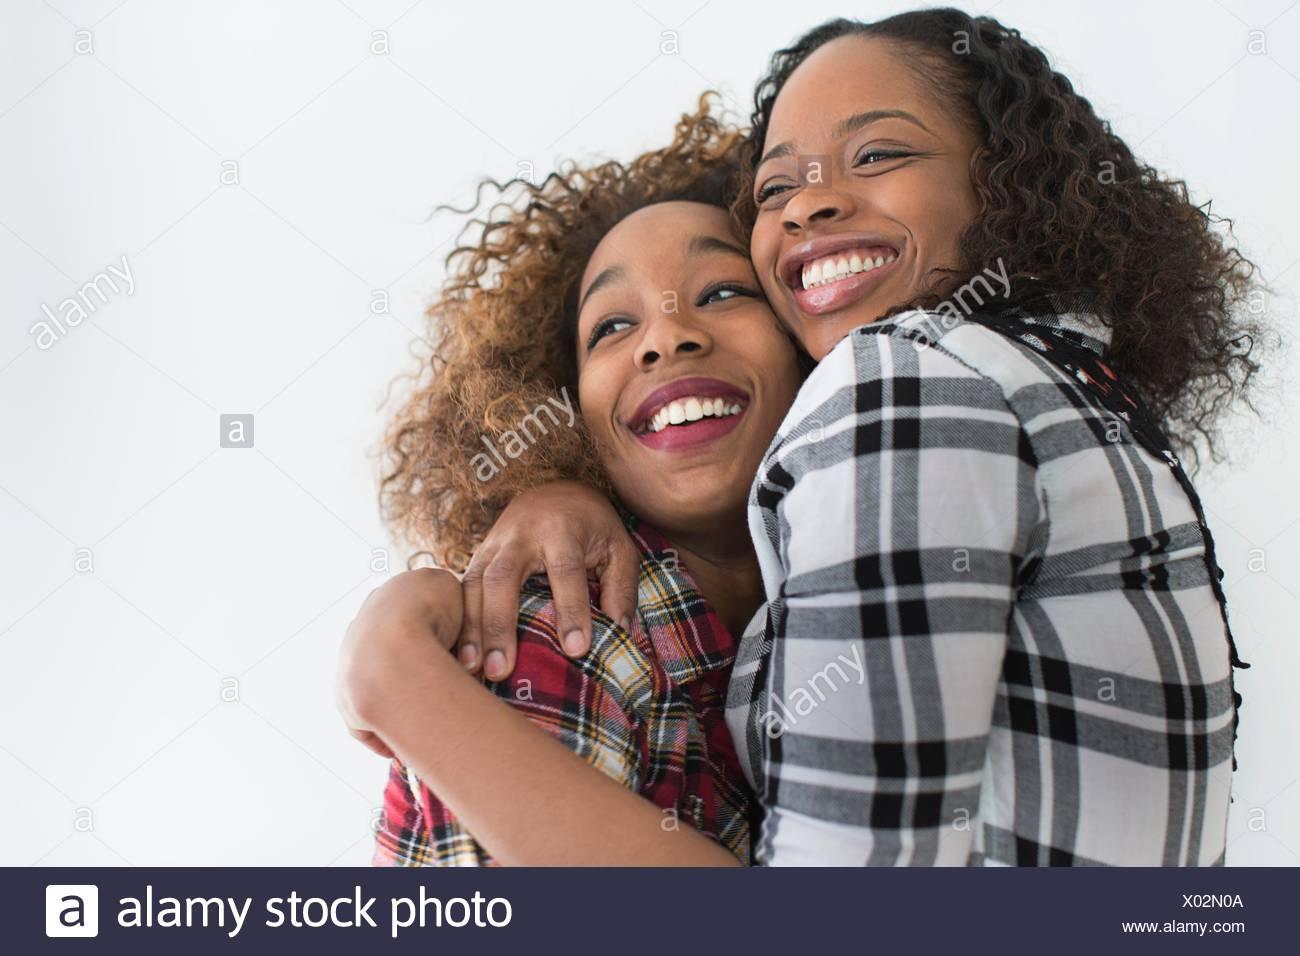 Studio-Porträt von zwei jungen Freundinnen umarmen Stockbild